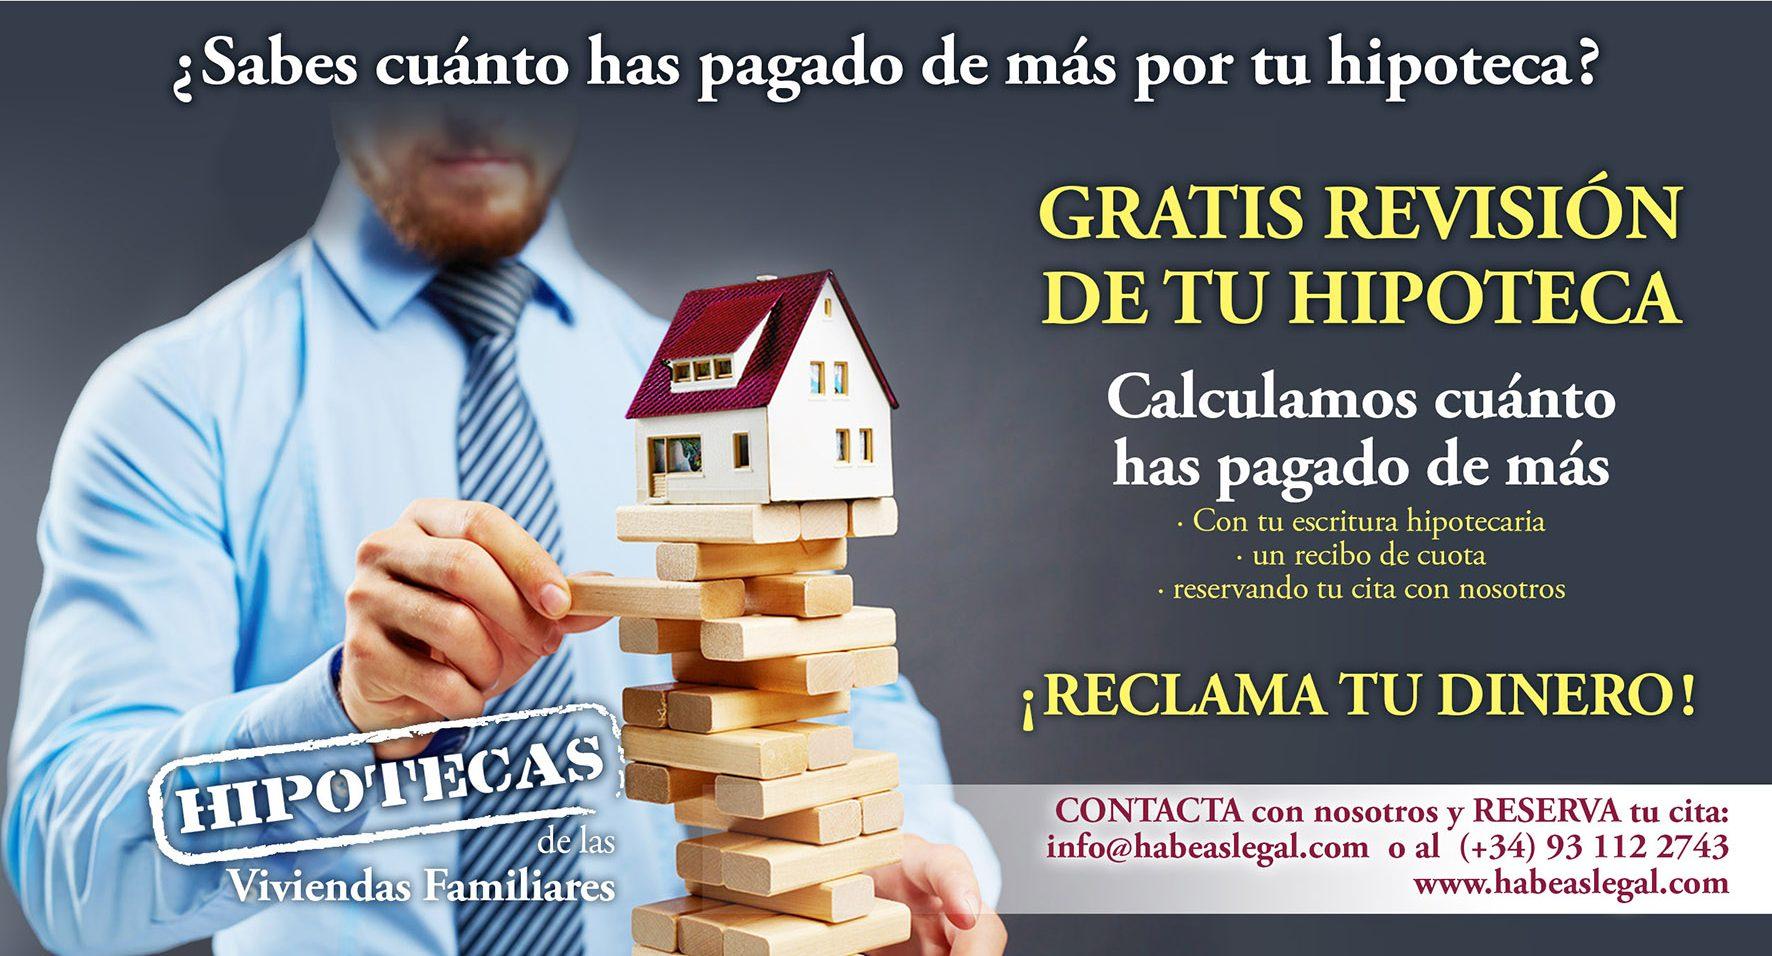 Hipoteca Tarjeton2 front 21x14.3 1 e1499580787133 - GRATIS Revisión de tu Hipoteca